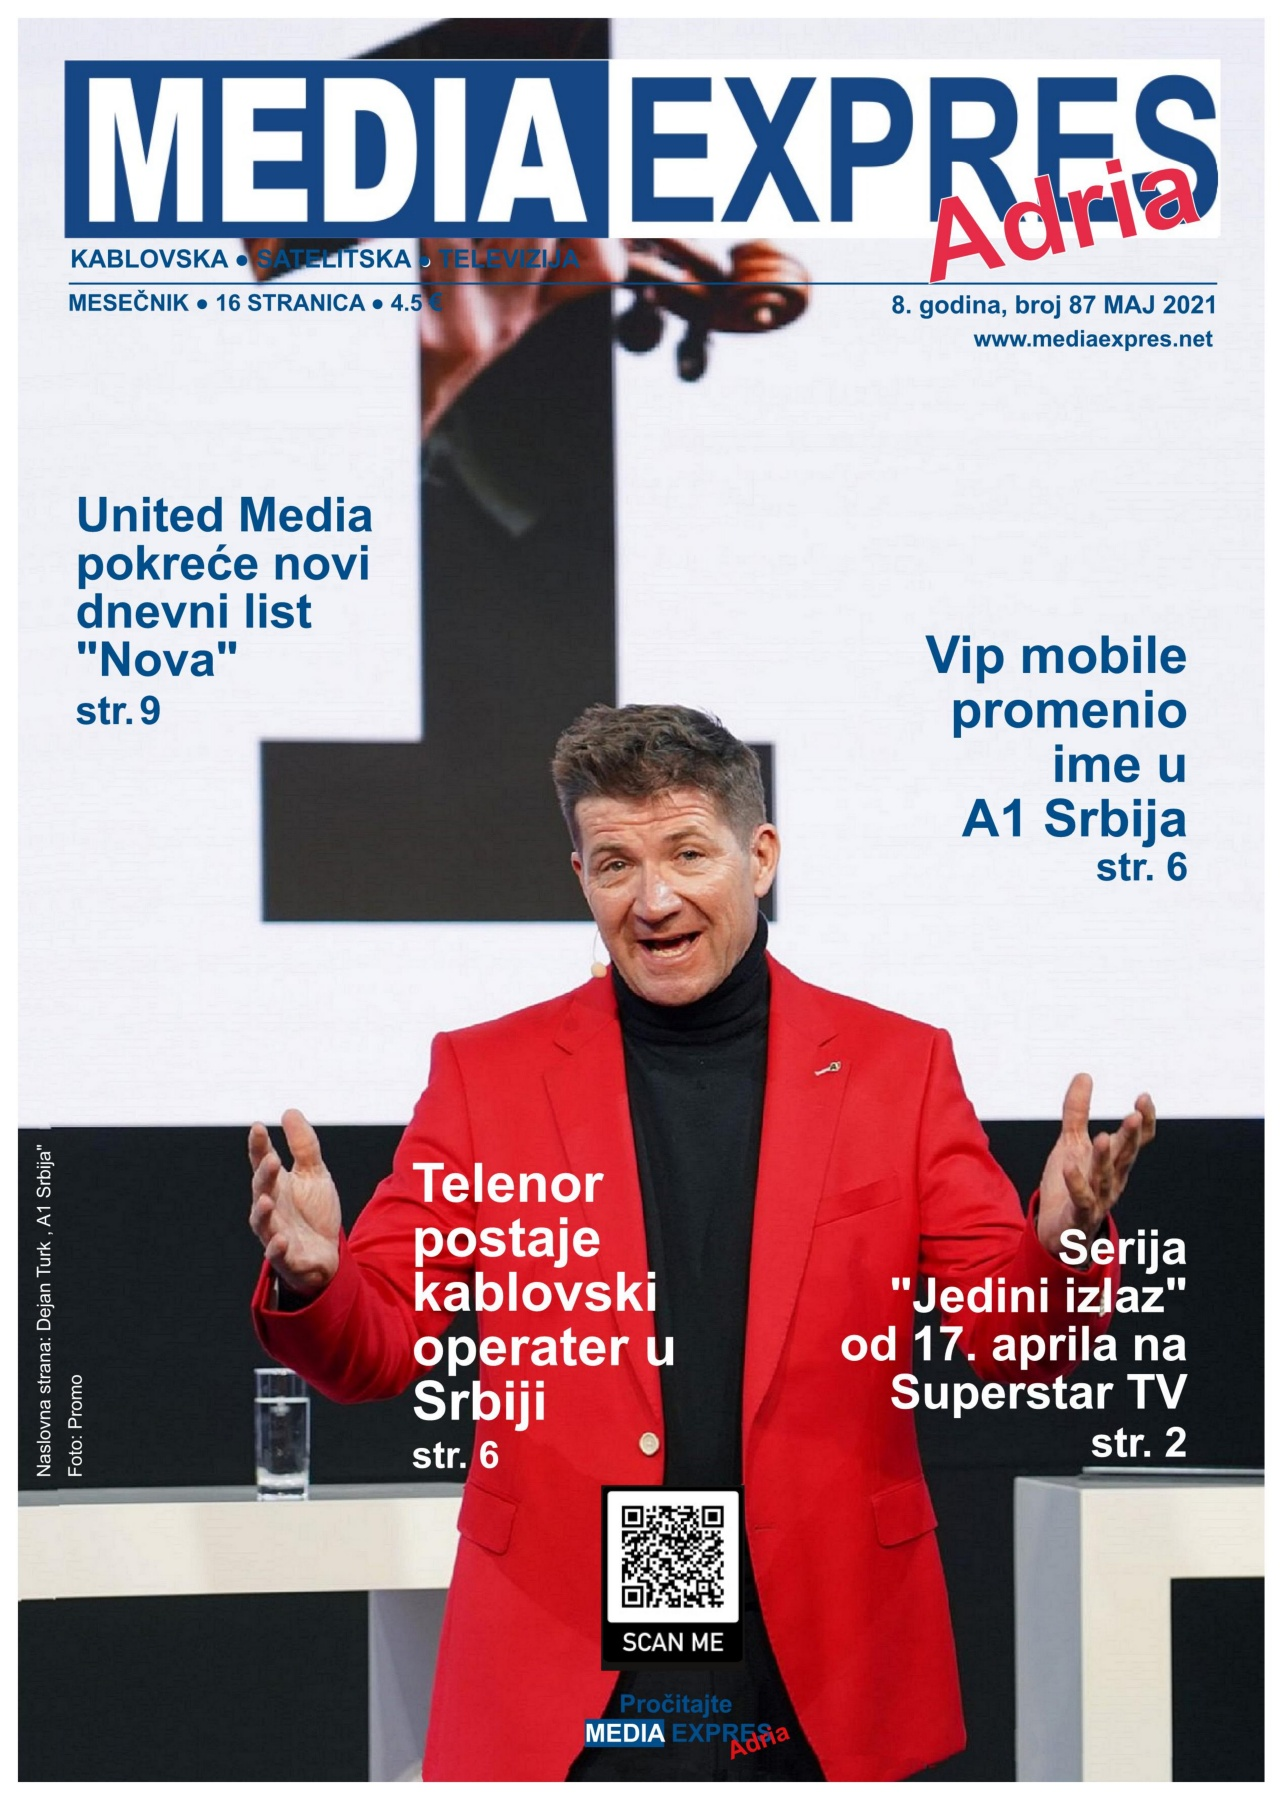 Media Expres Adria No 5 Maj 2021 1st Cover